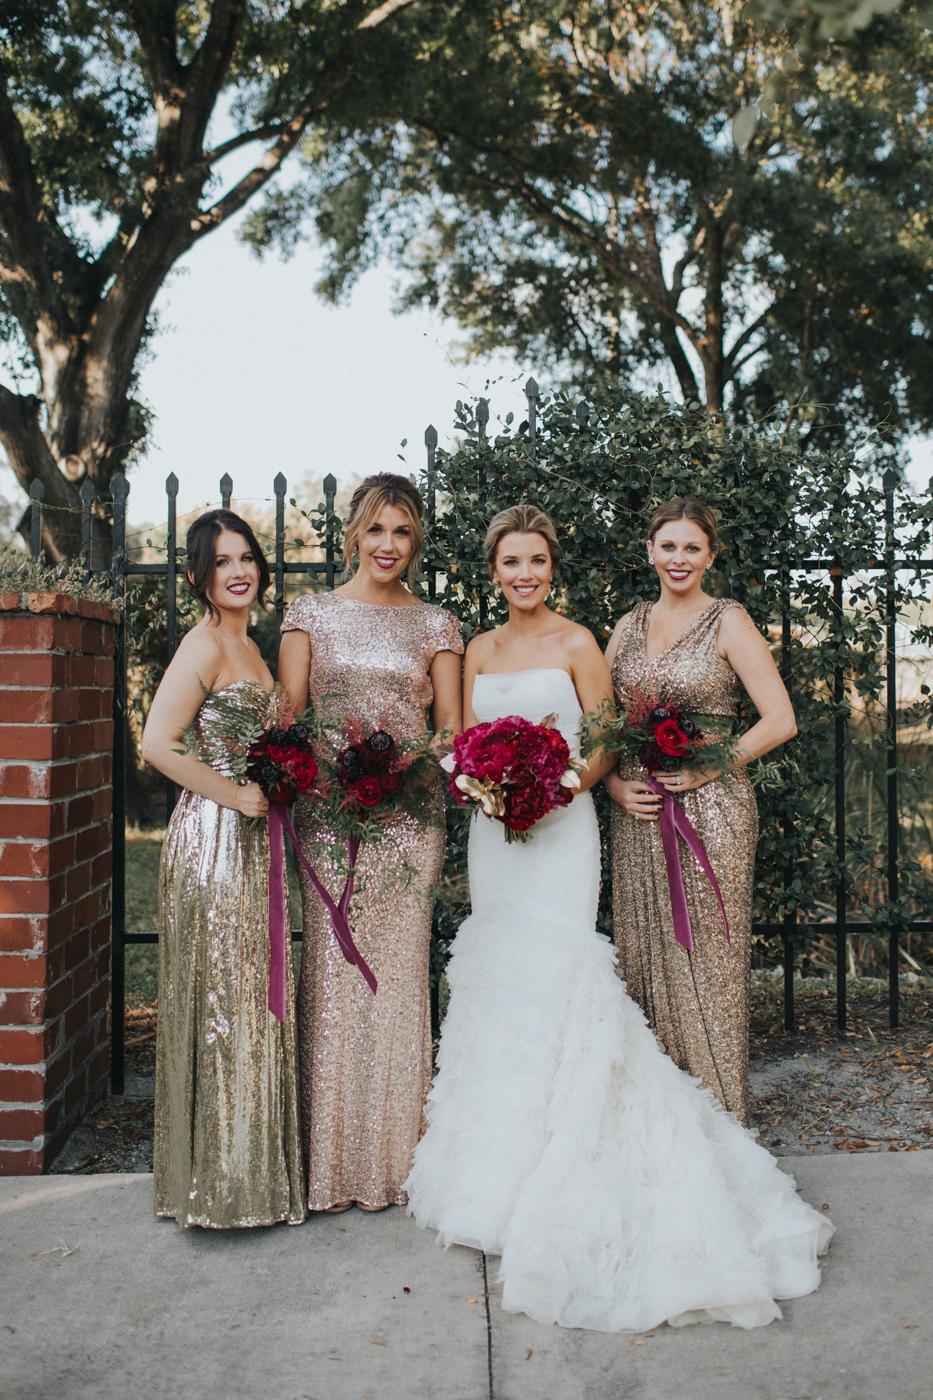 Bride in Liancarlo dress bridesmaids in gold sequin dresses fall wedding flower ideas